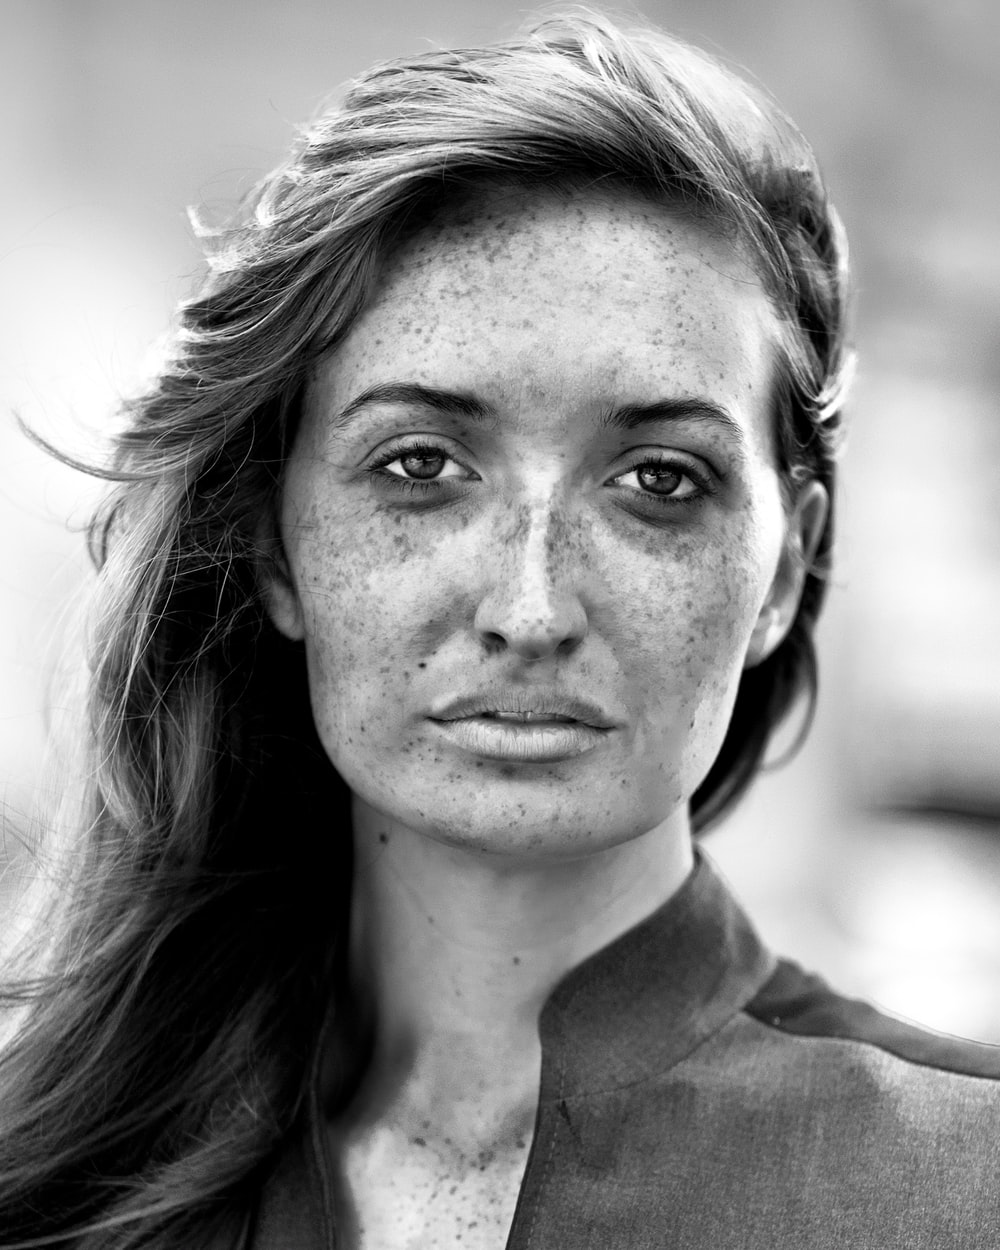 grayscale portrait photo of woman